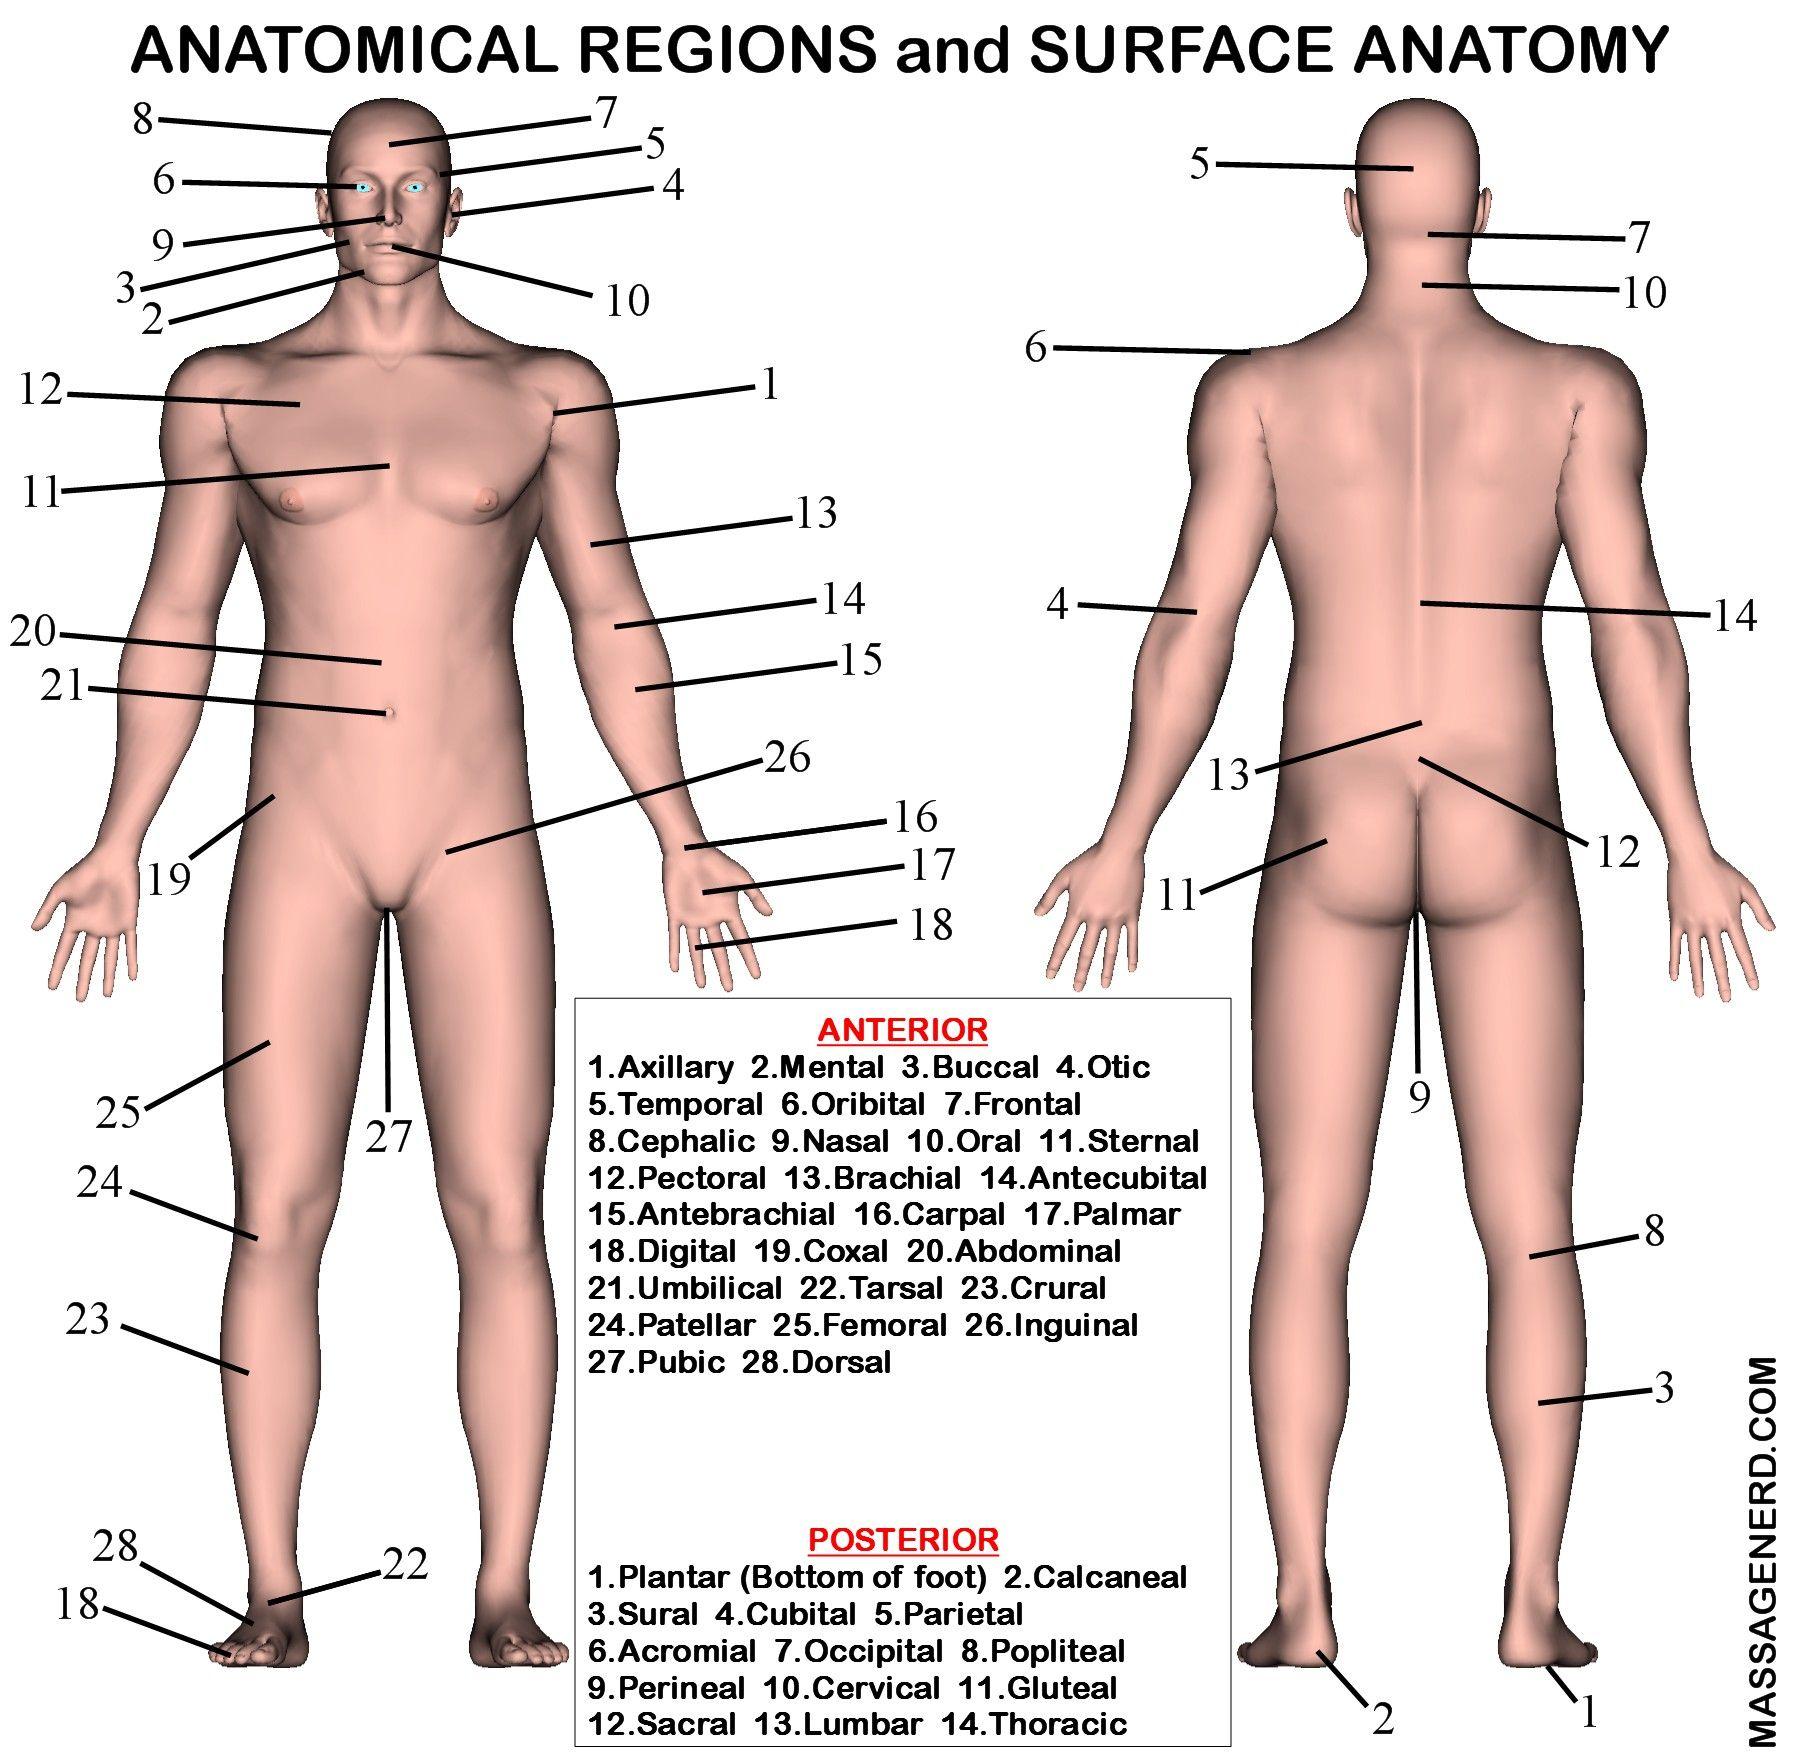 Surface Anatomy Landmarks Human Body